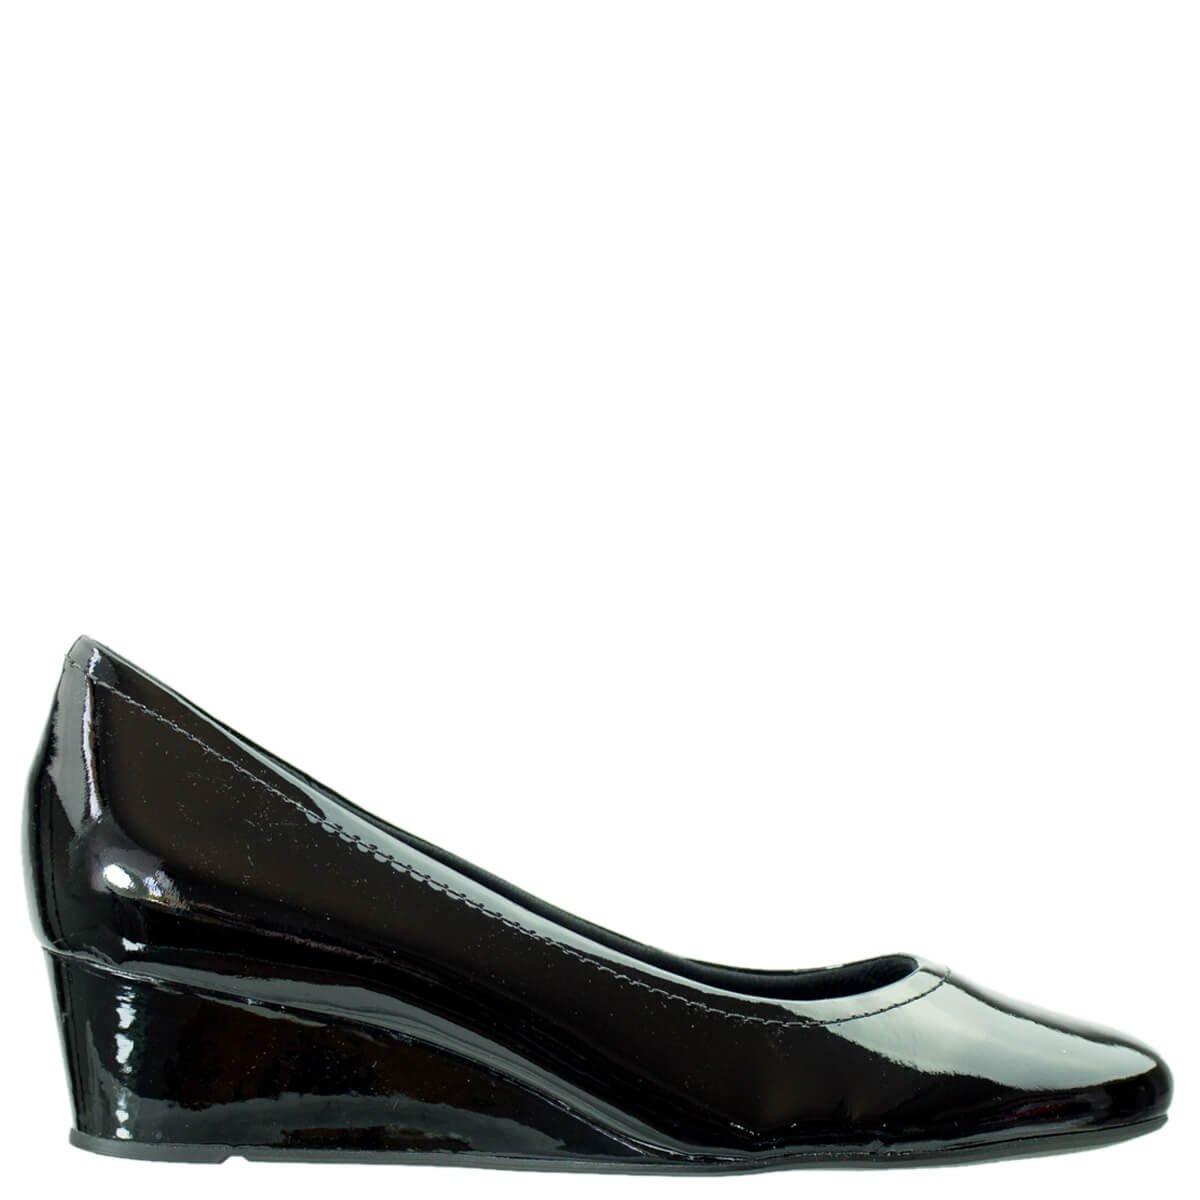 07755de8c Bizz Store - Sapato Feminino Usaflex Luxor Salto Anabela